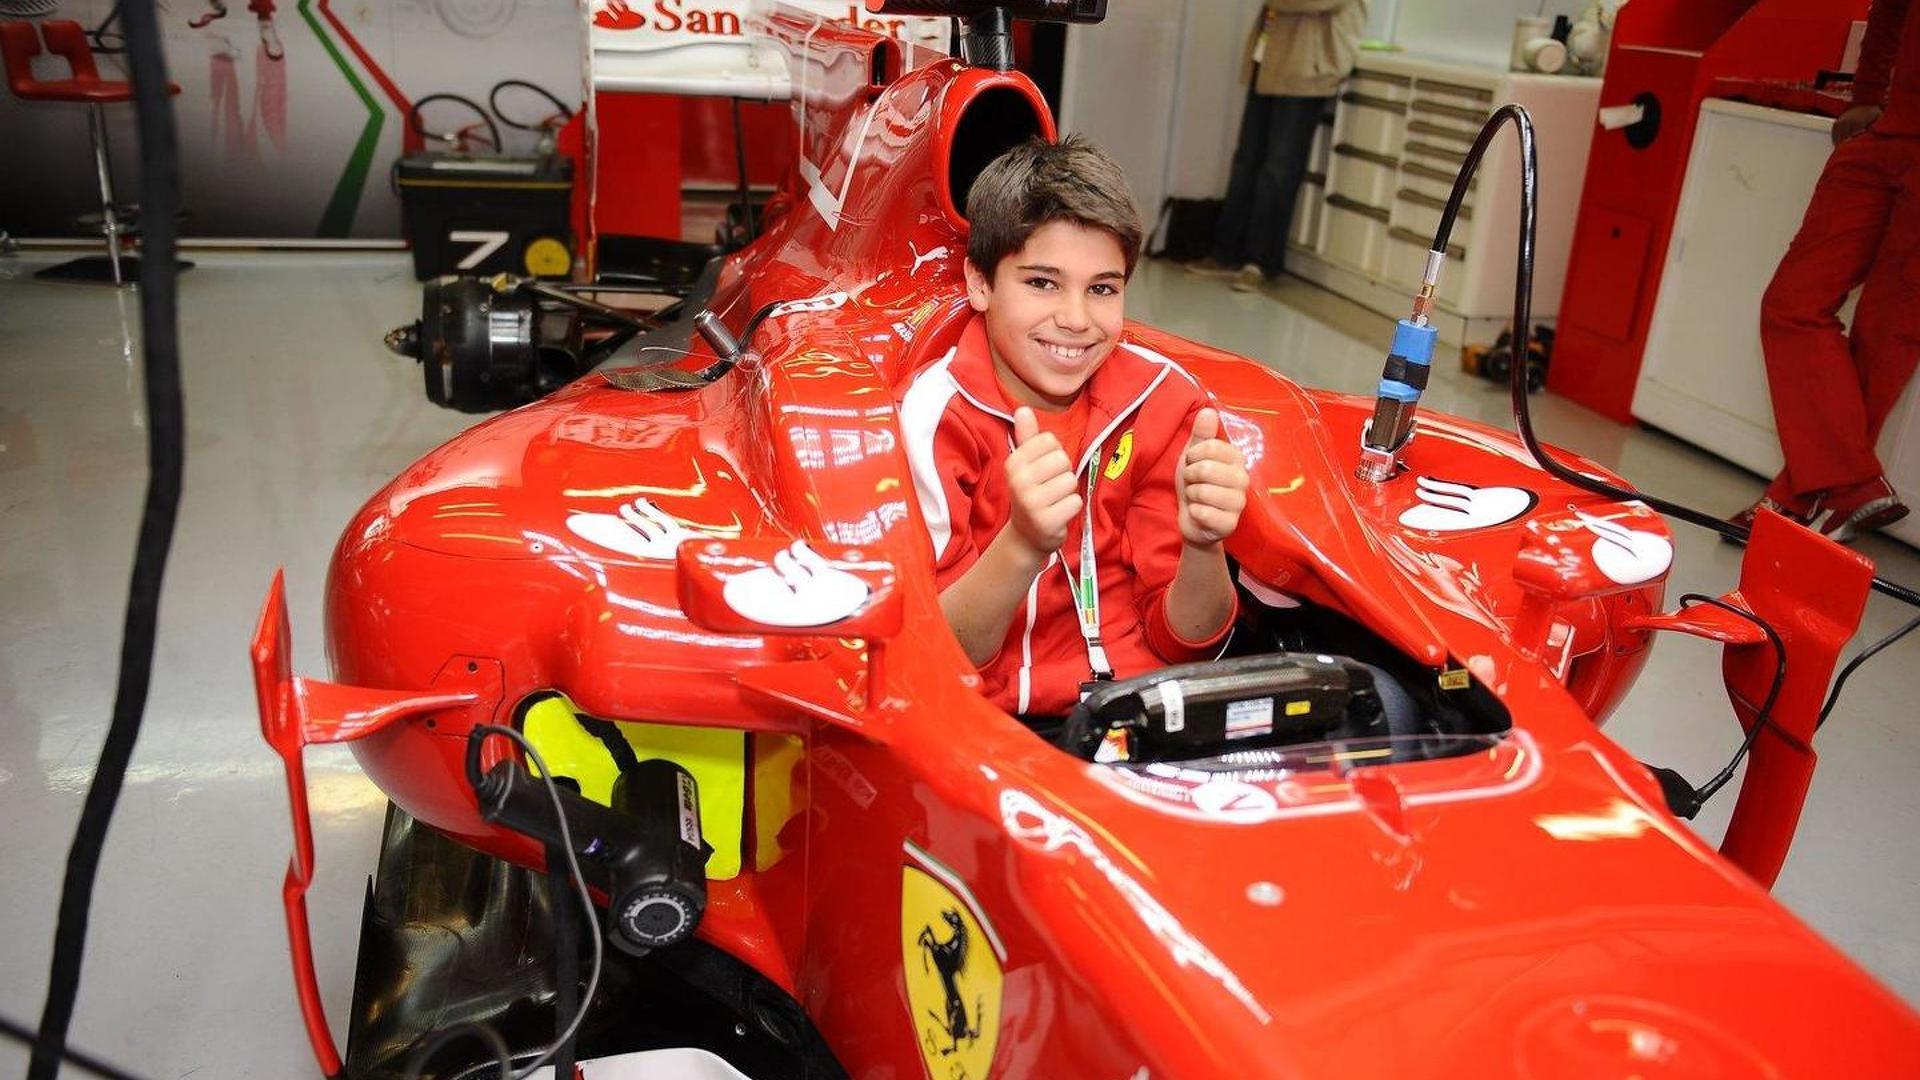 Ferrari Signs 11 Year Old Canadian Karting Champ For Ferrari Driver Academy